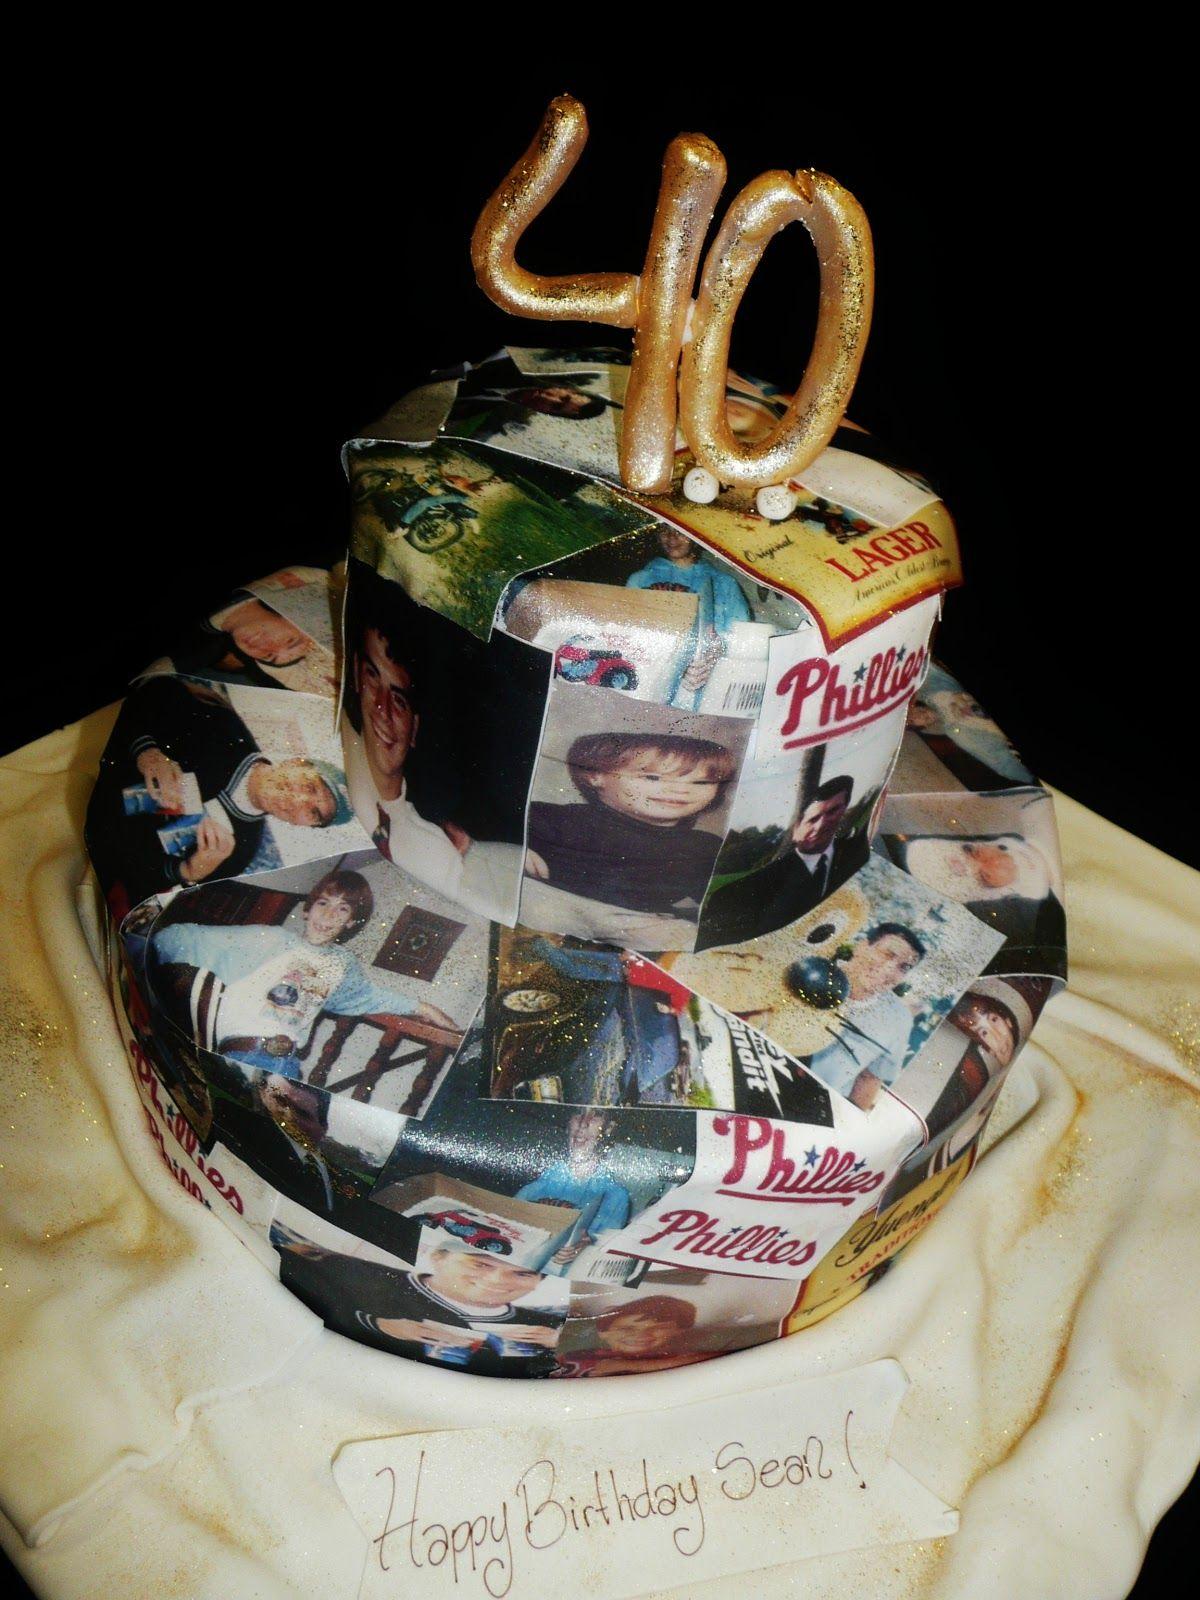 40th Birthday Cake 40th birthday